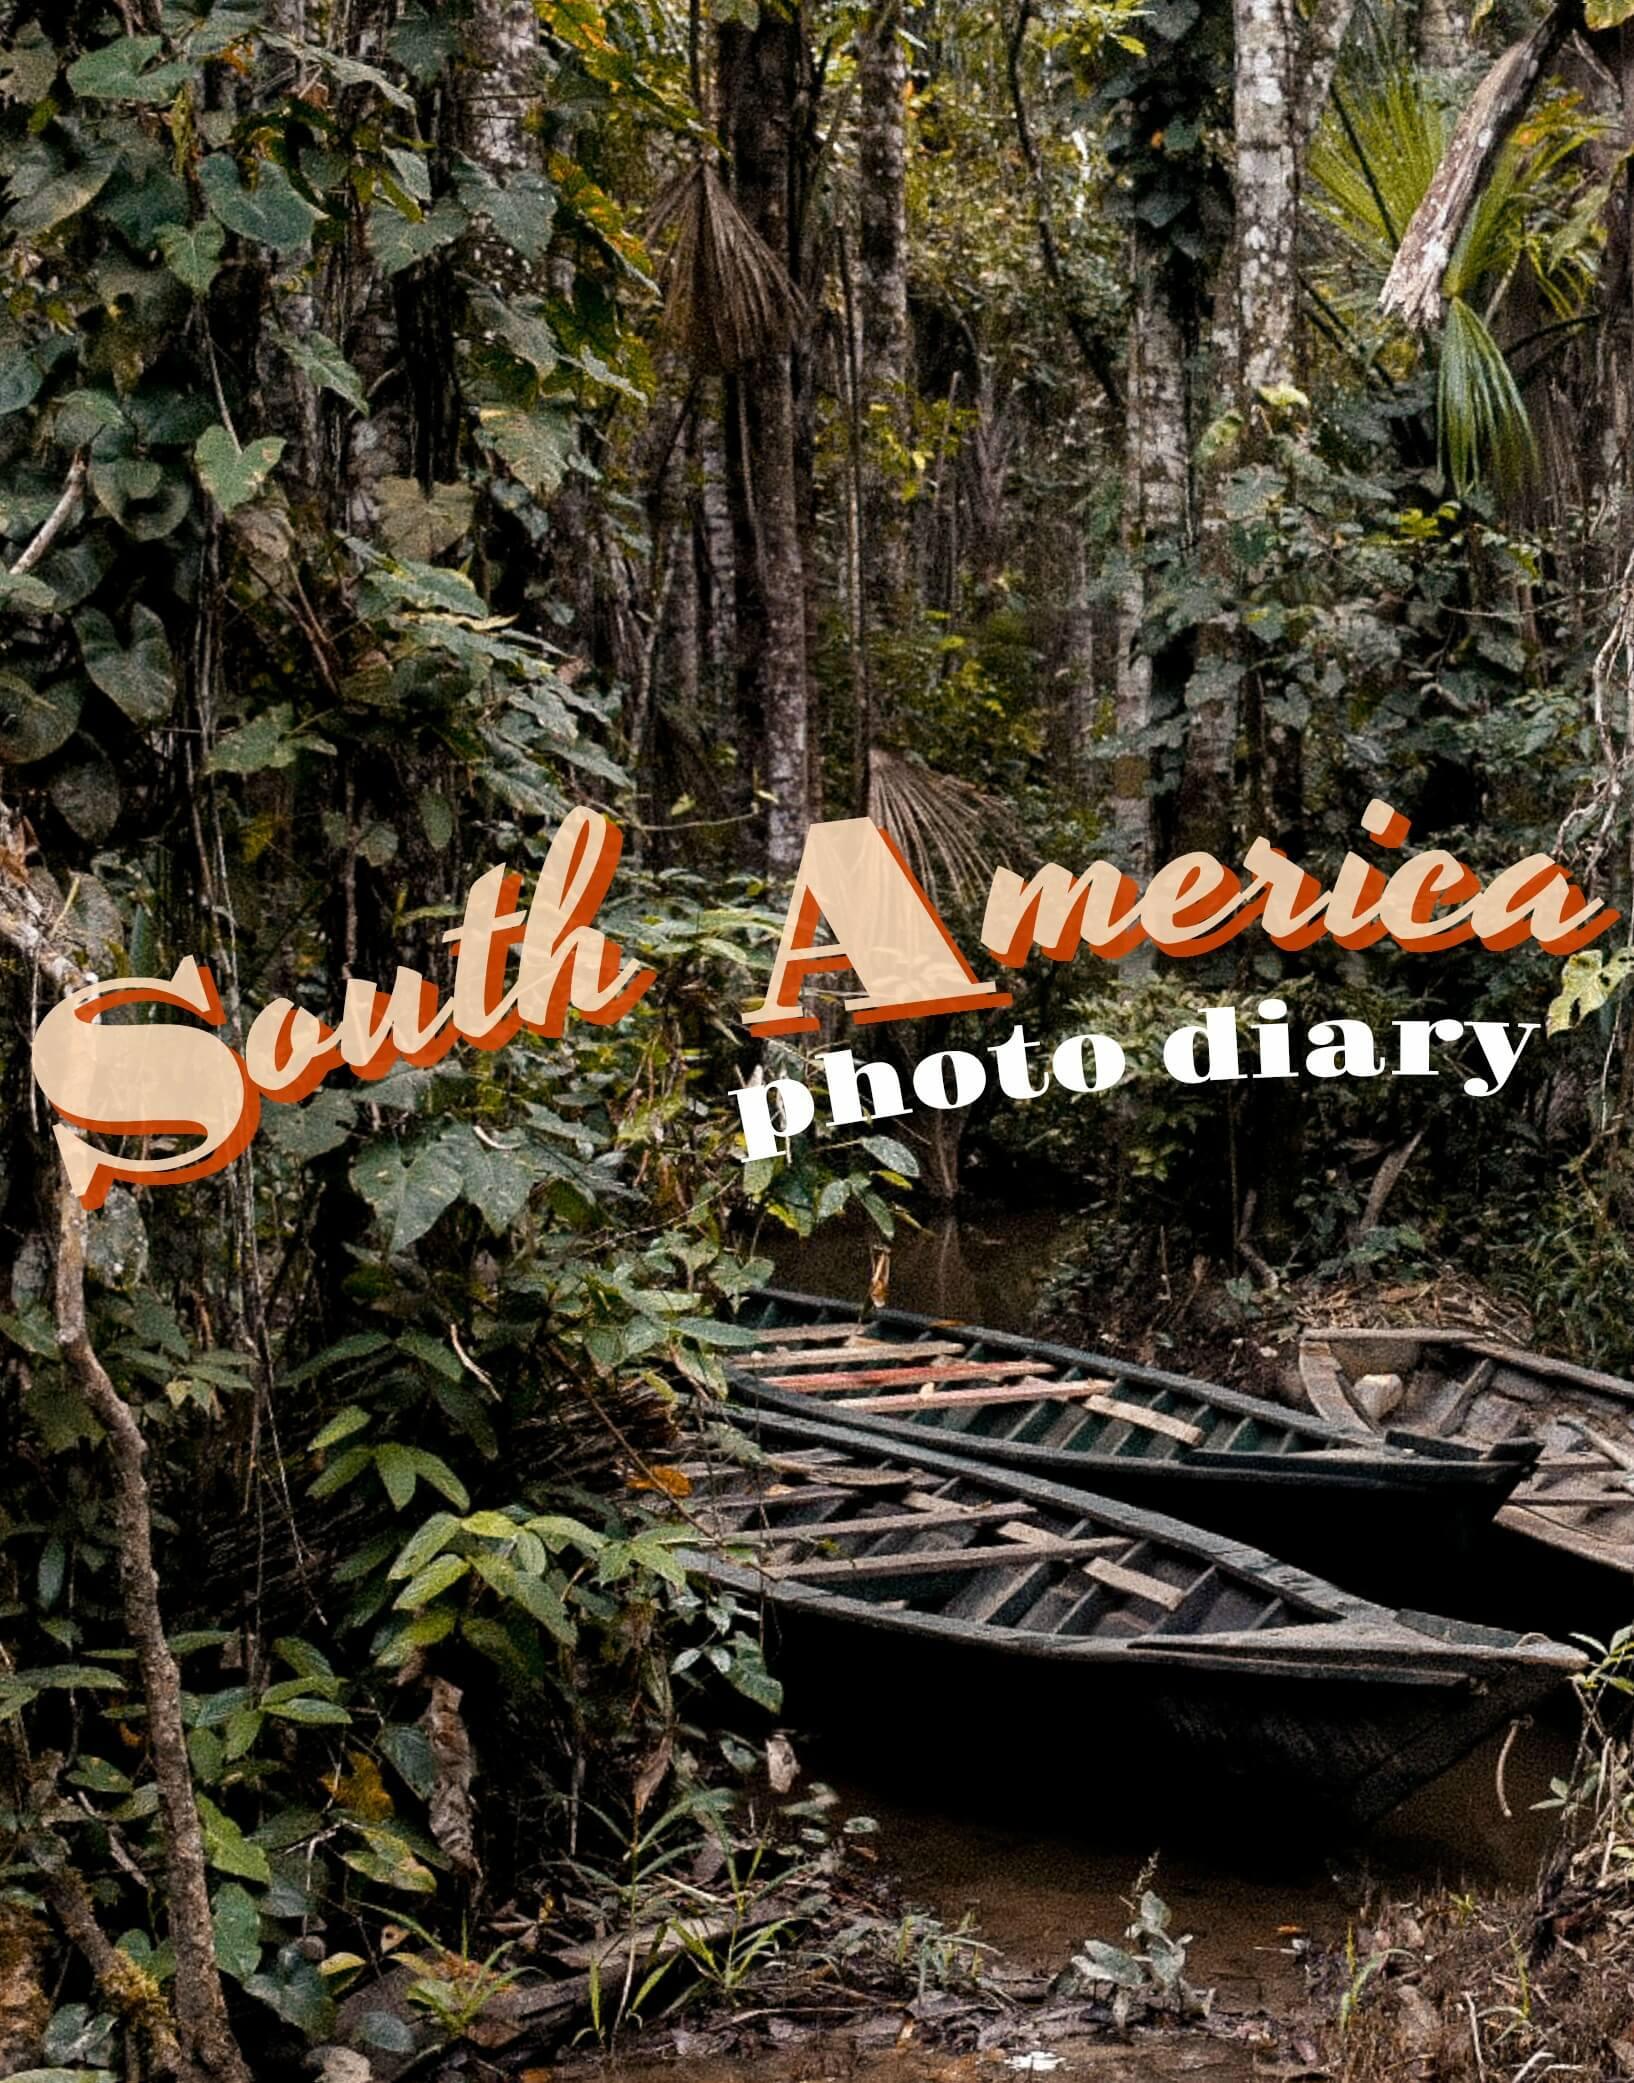 SOUTH AMERICA PHOTO DIARY